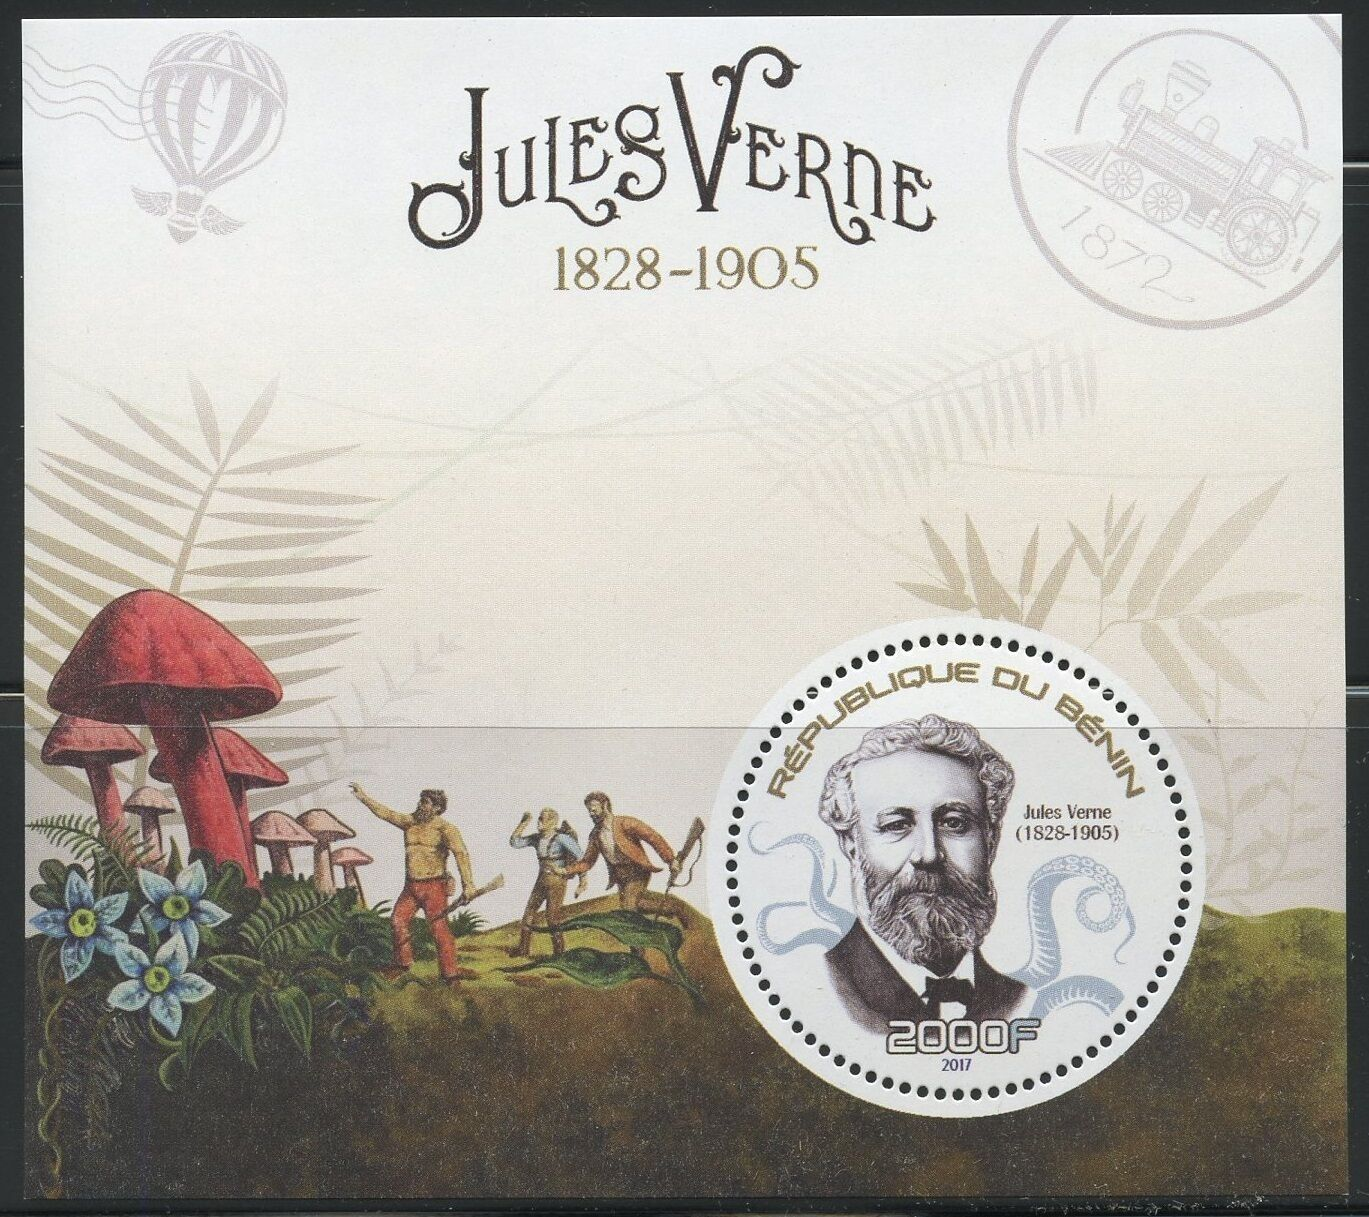 Benin - Jules Verne souvenir sheet released in 2017